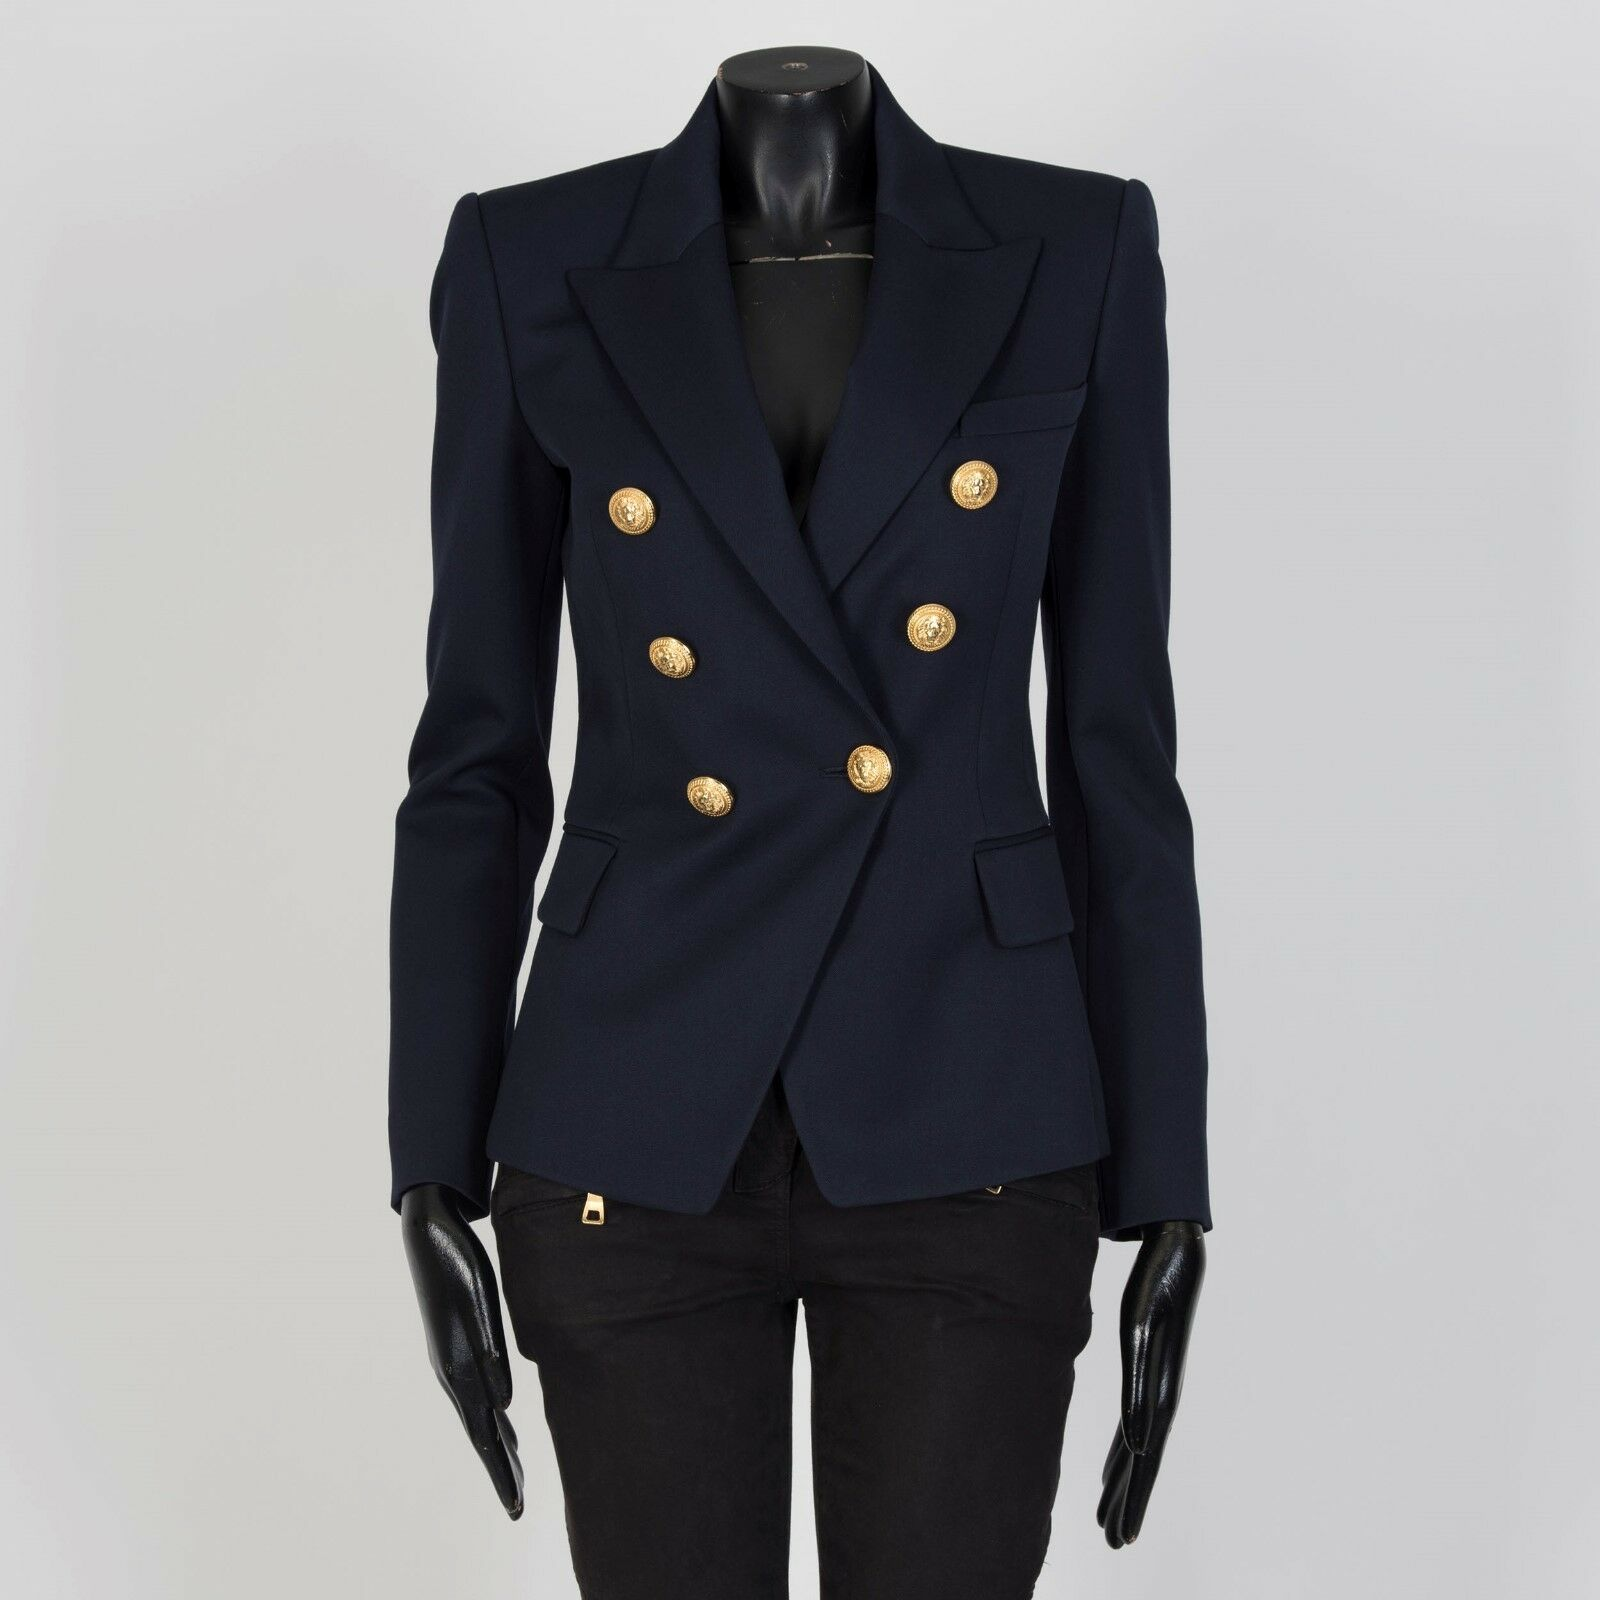 BALMAIN 2195  Double Breasted Blazer In Navy Wool Twill